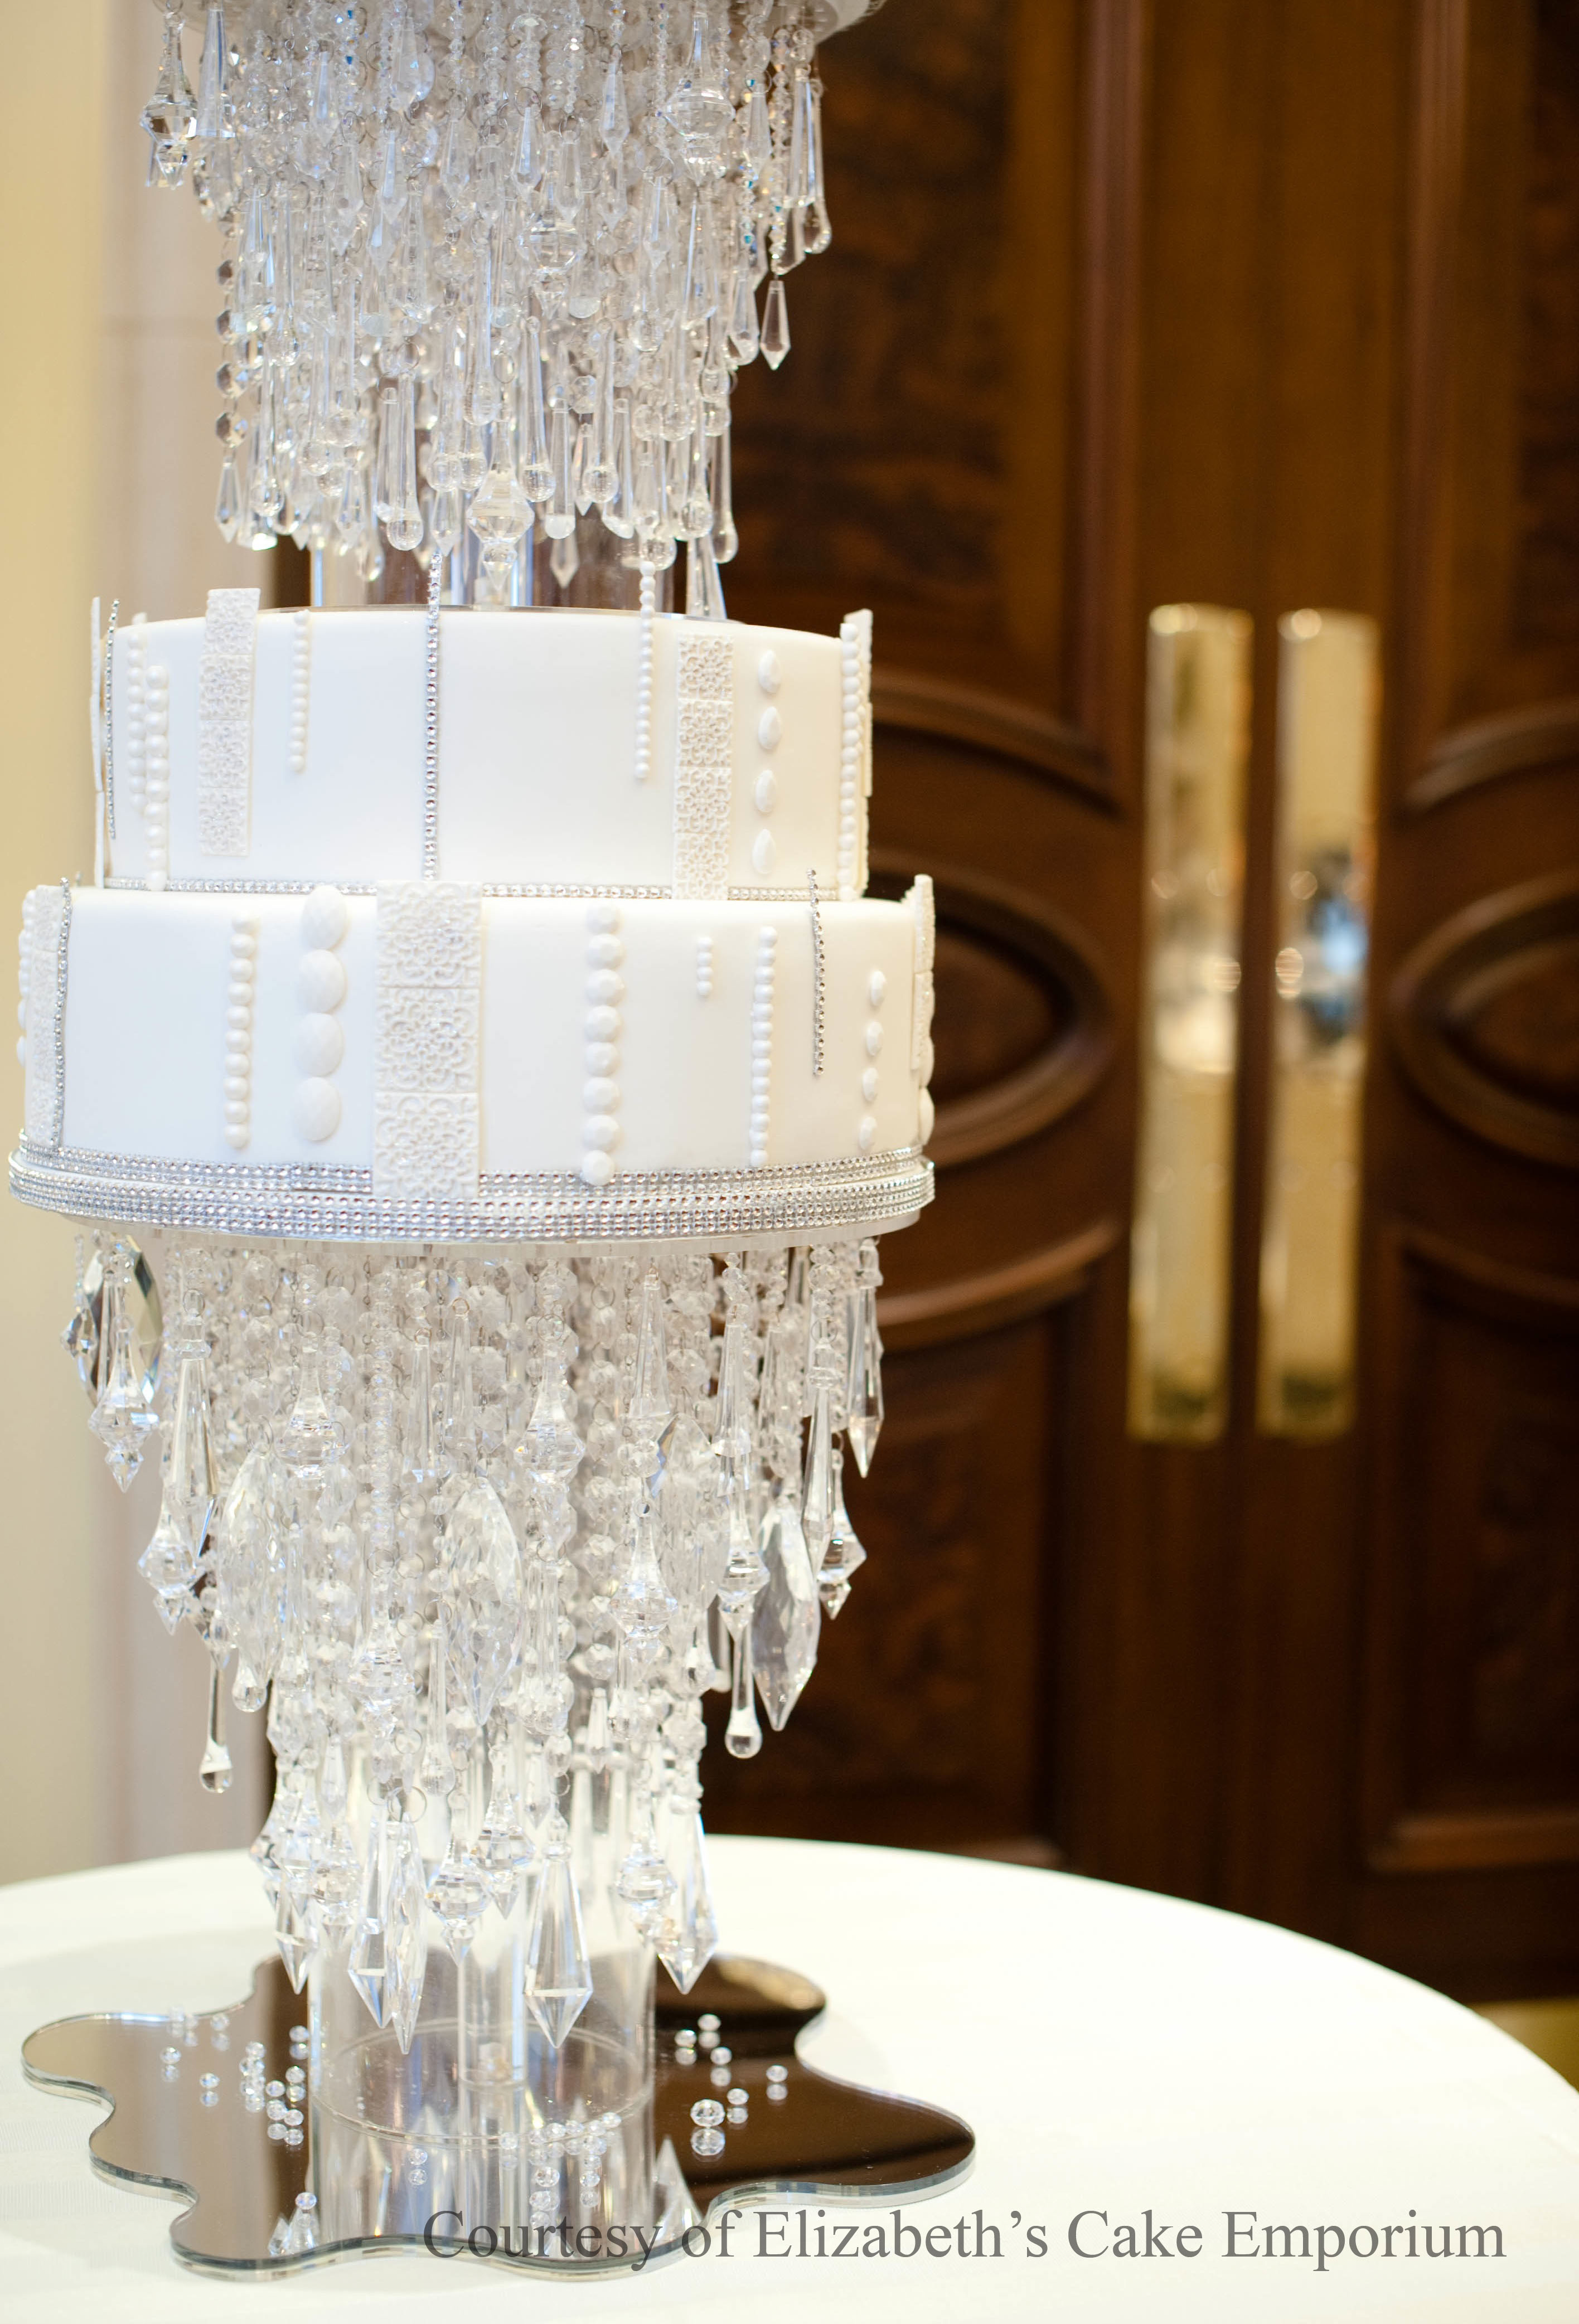 Featuring cake artist Elizabeth Solaru